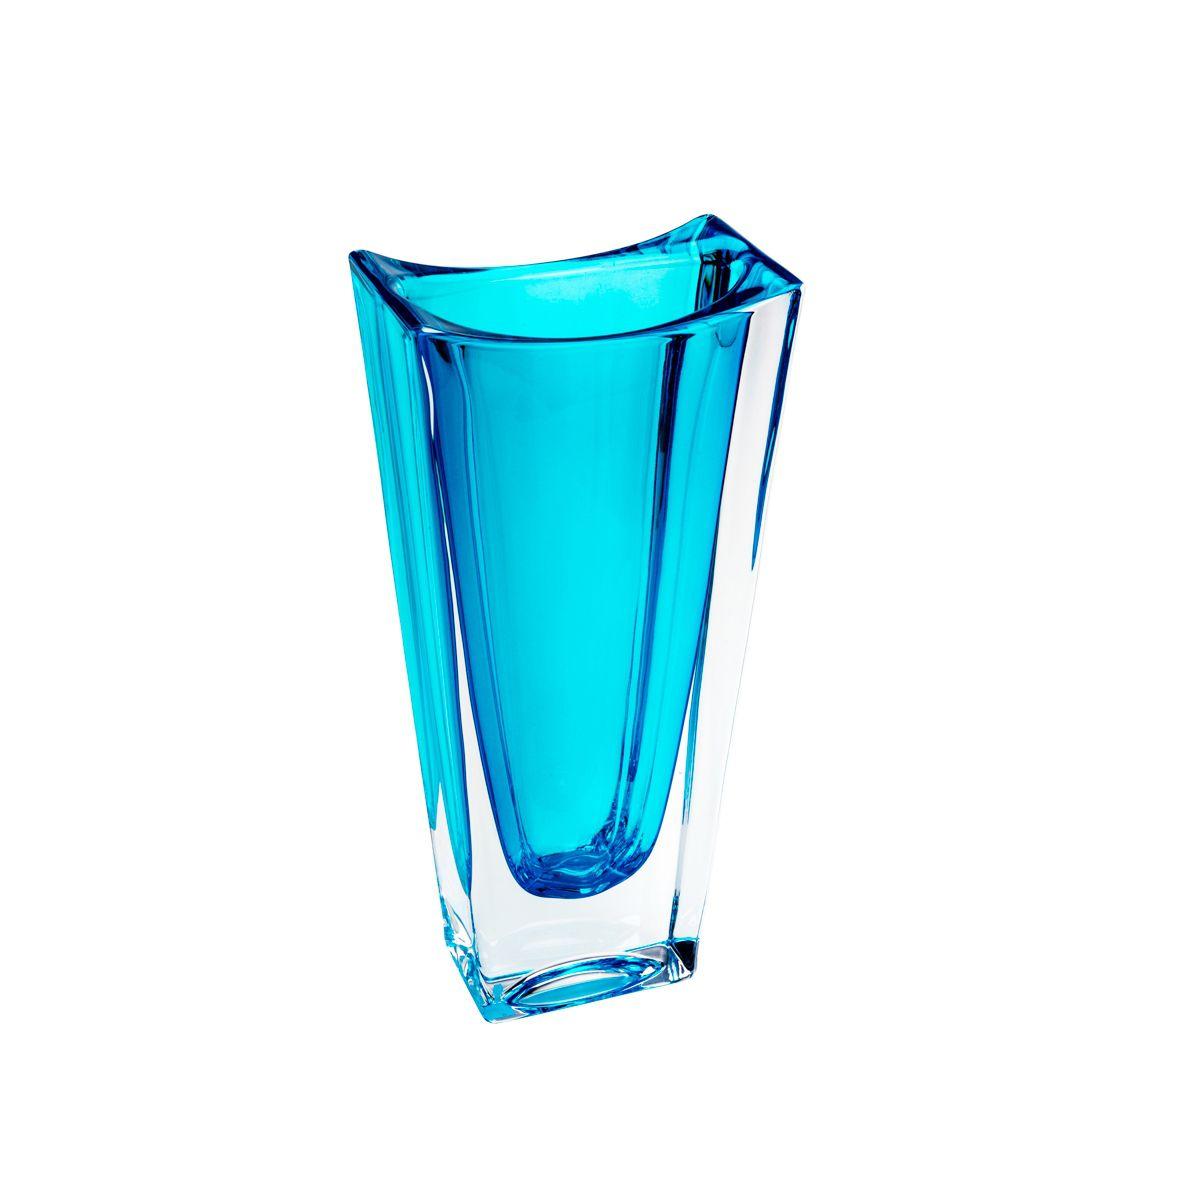 Vaso de Cristal Ecológico Azul  Turquesa  Bohemia